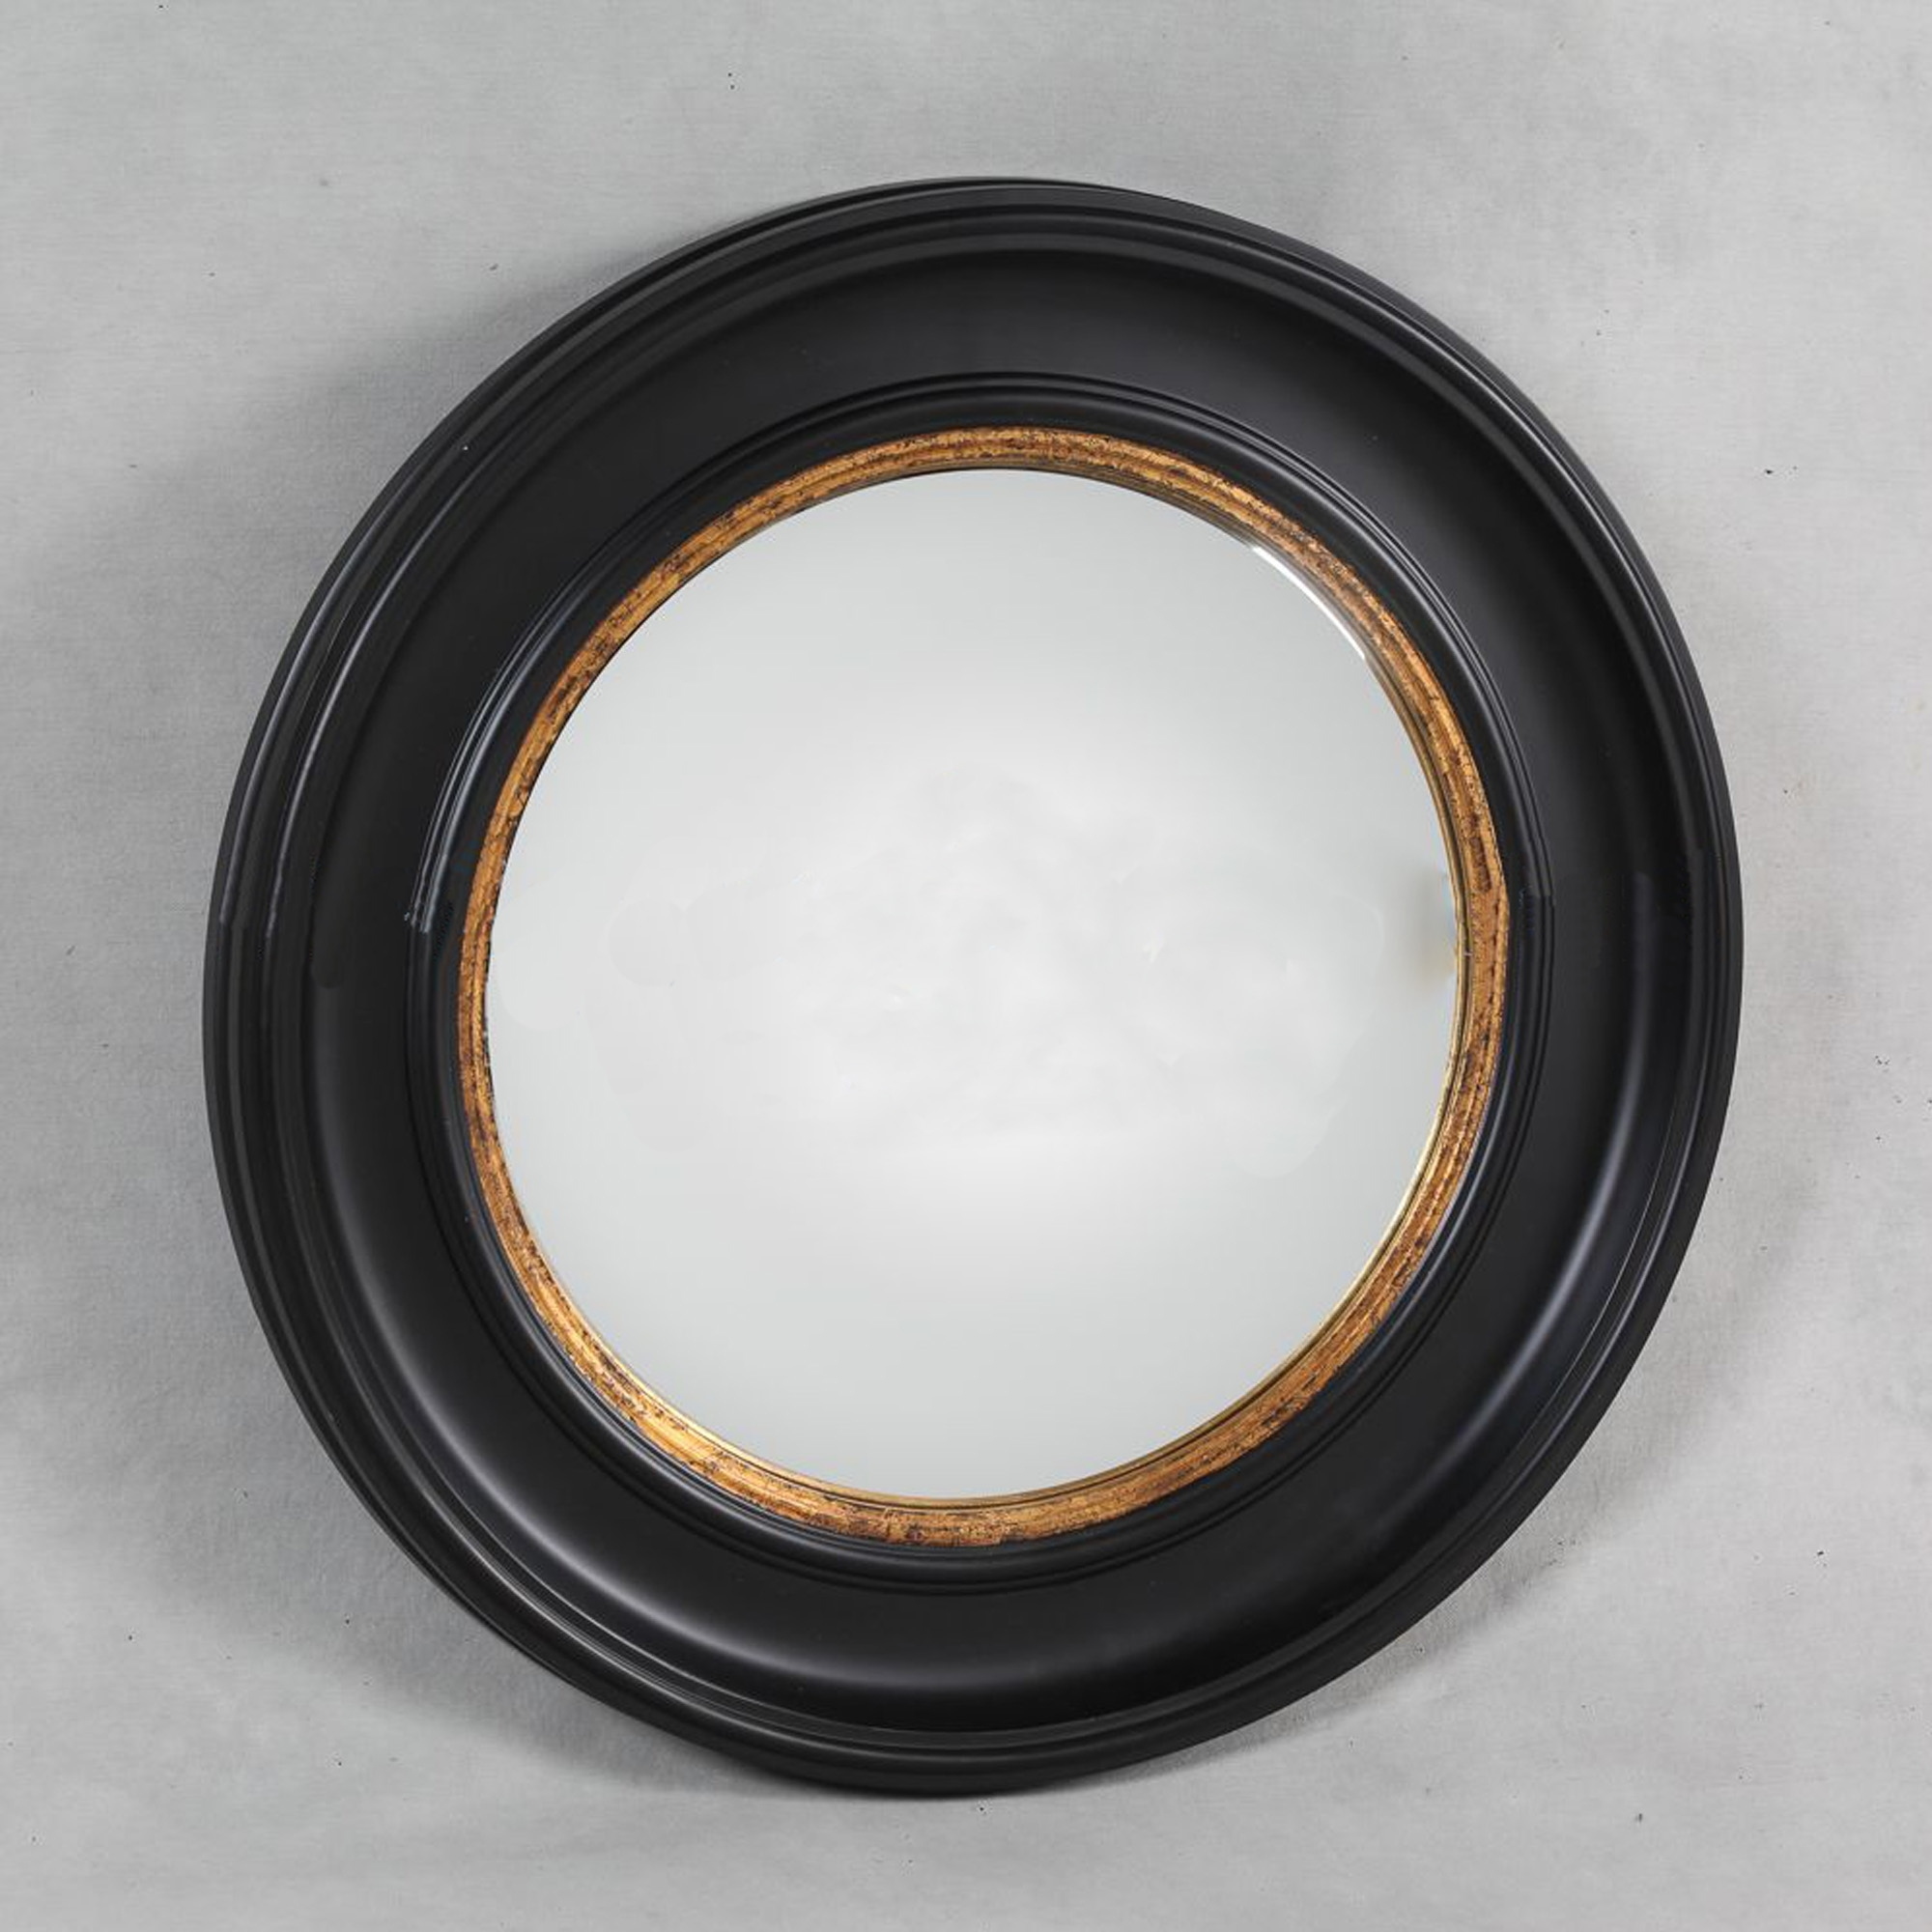 Deep Black Framed Convex Mirror